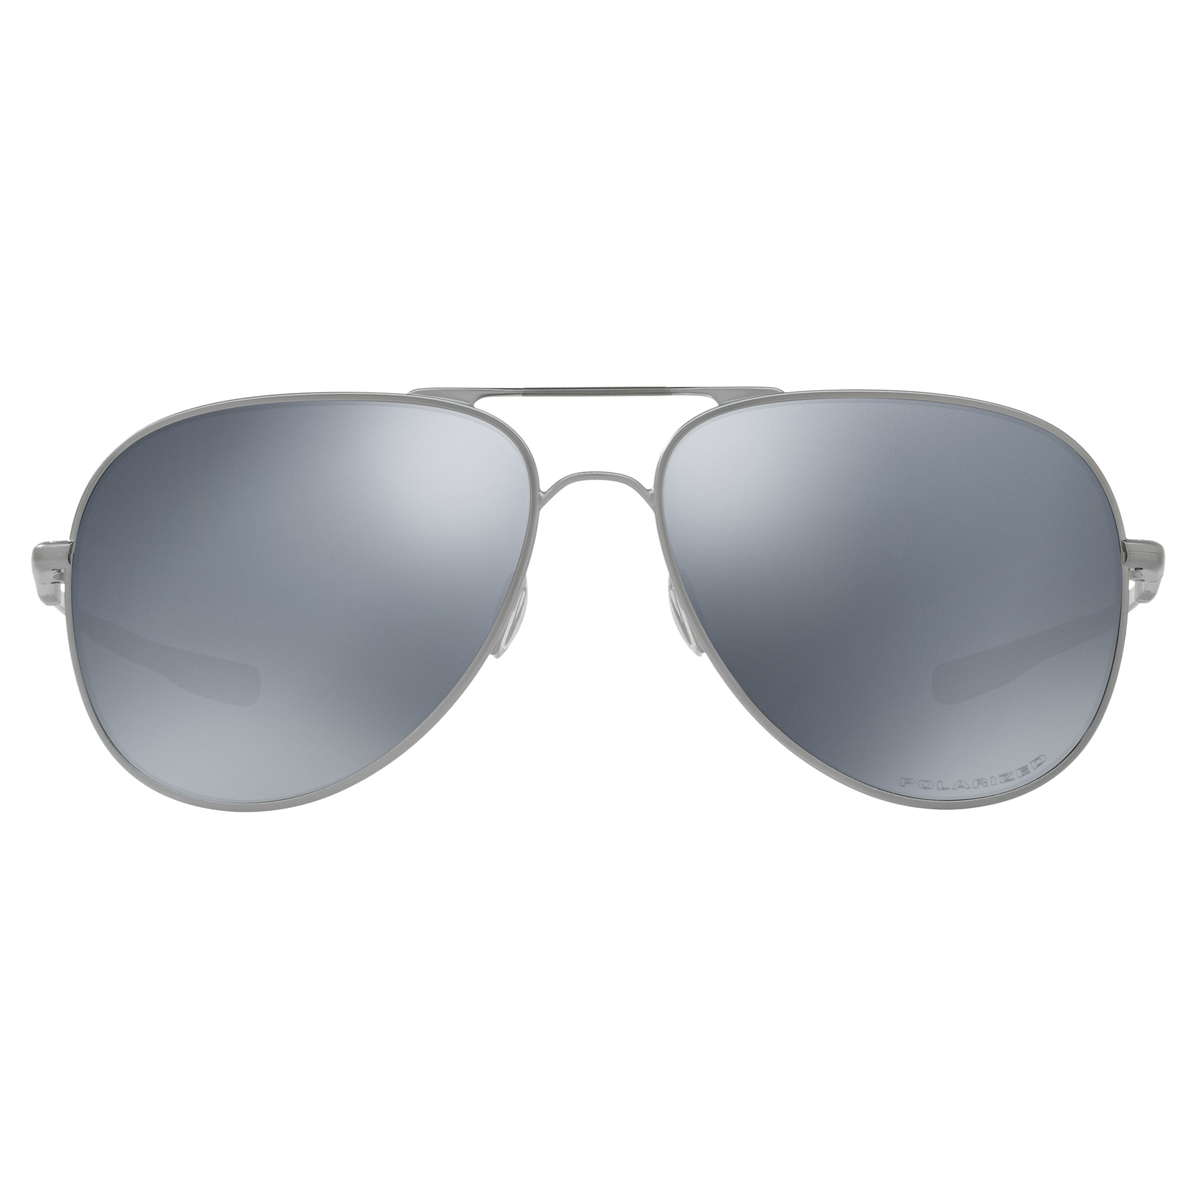 Óculos Oakley Elmont L Lead  Lente Black Iridium Polarizado ref OO4119-06 bb8f9d1bd8